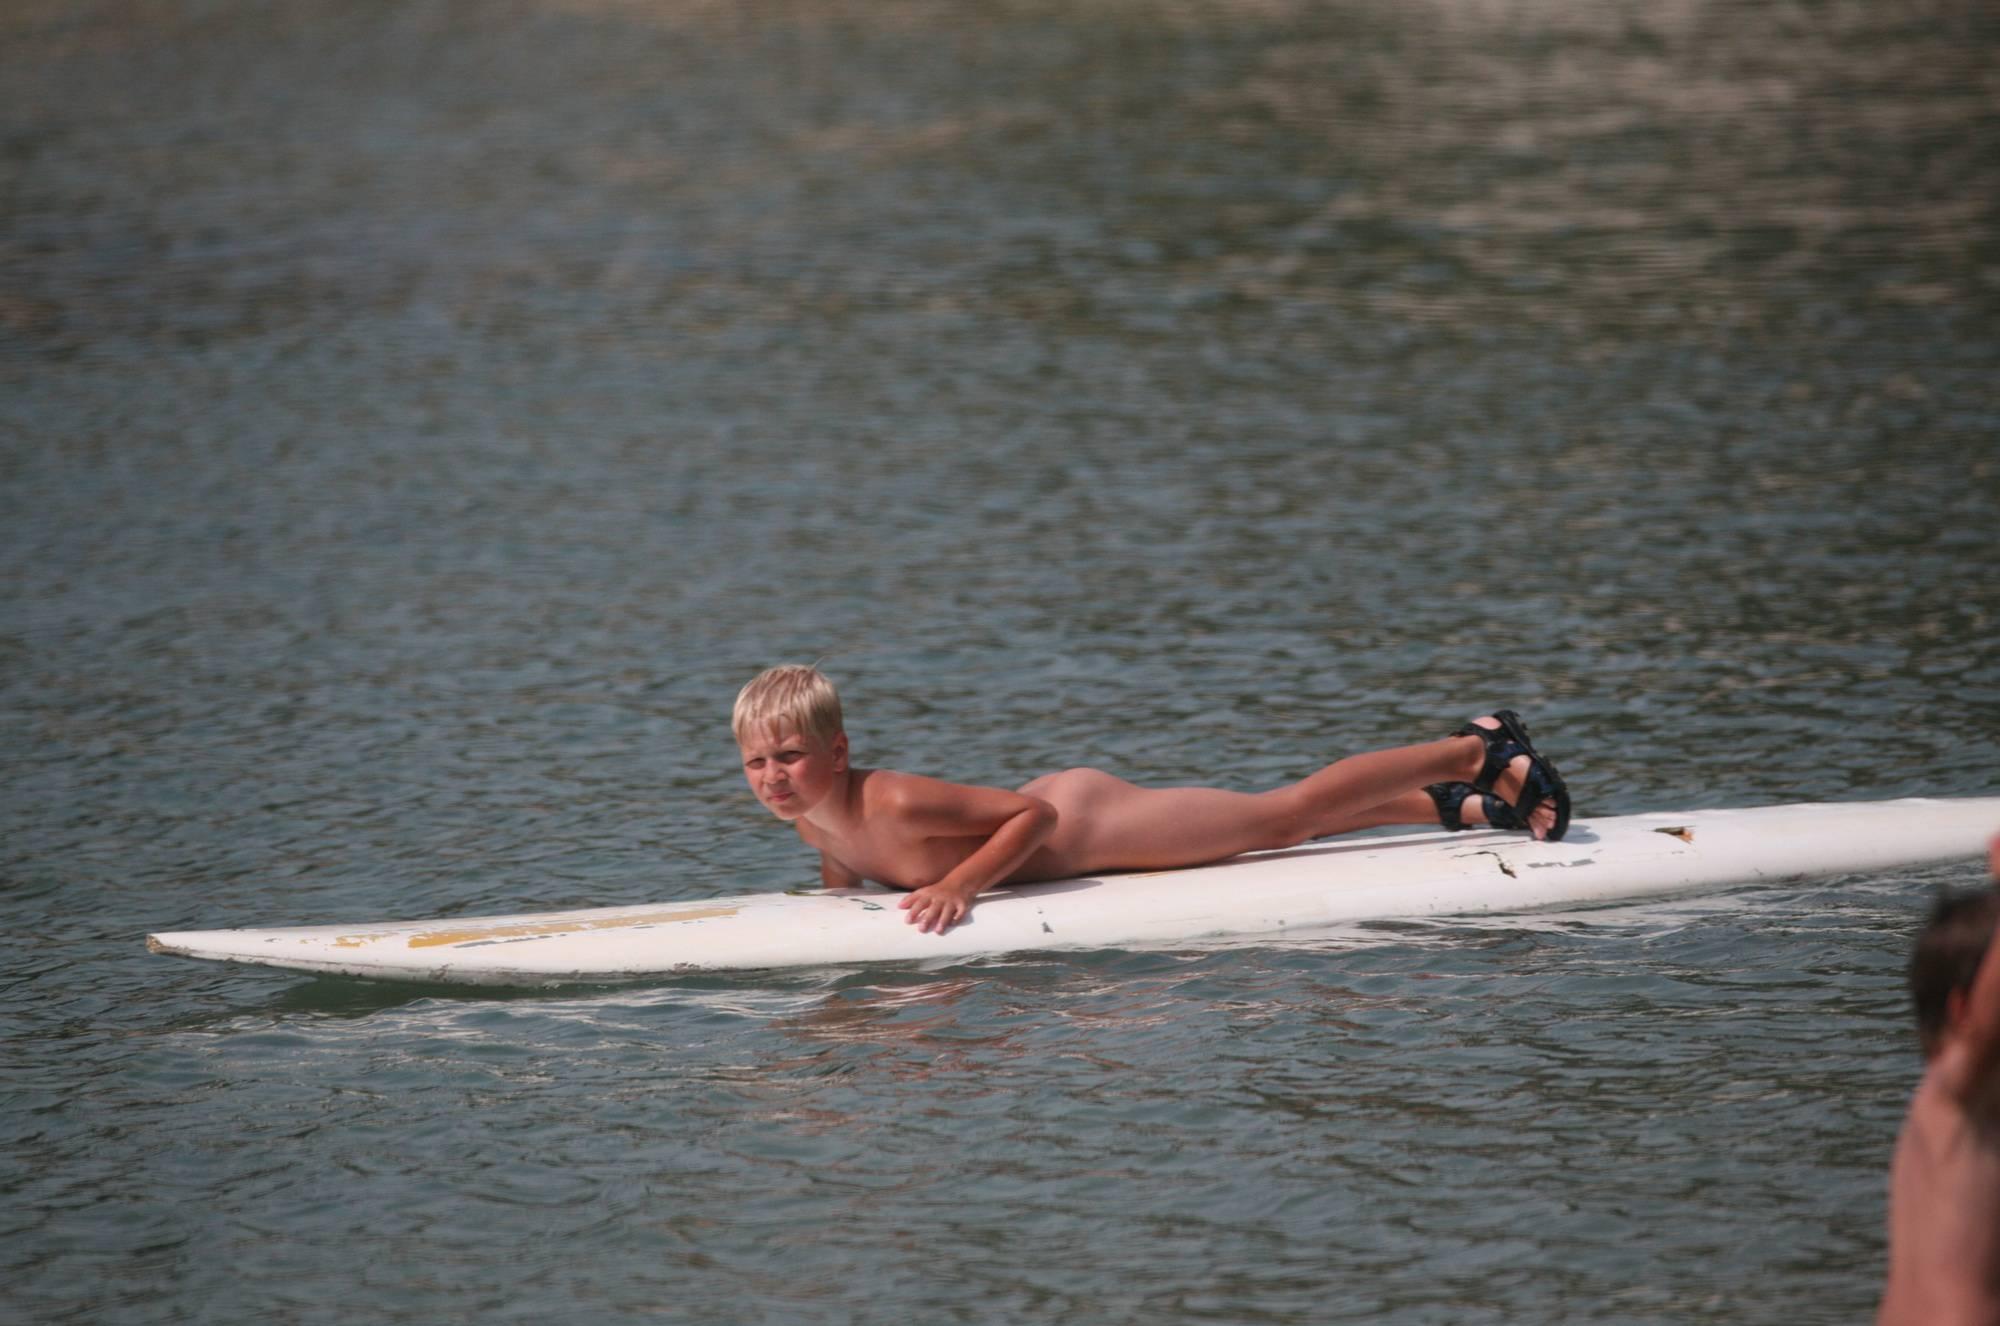 Purenudism Photos-Naturist White Boy Surfer - 1